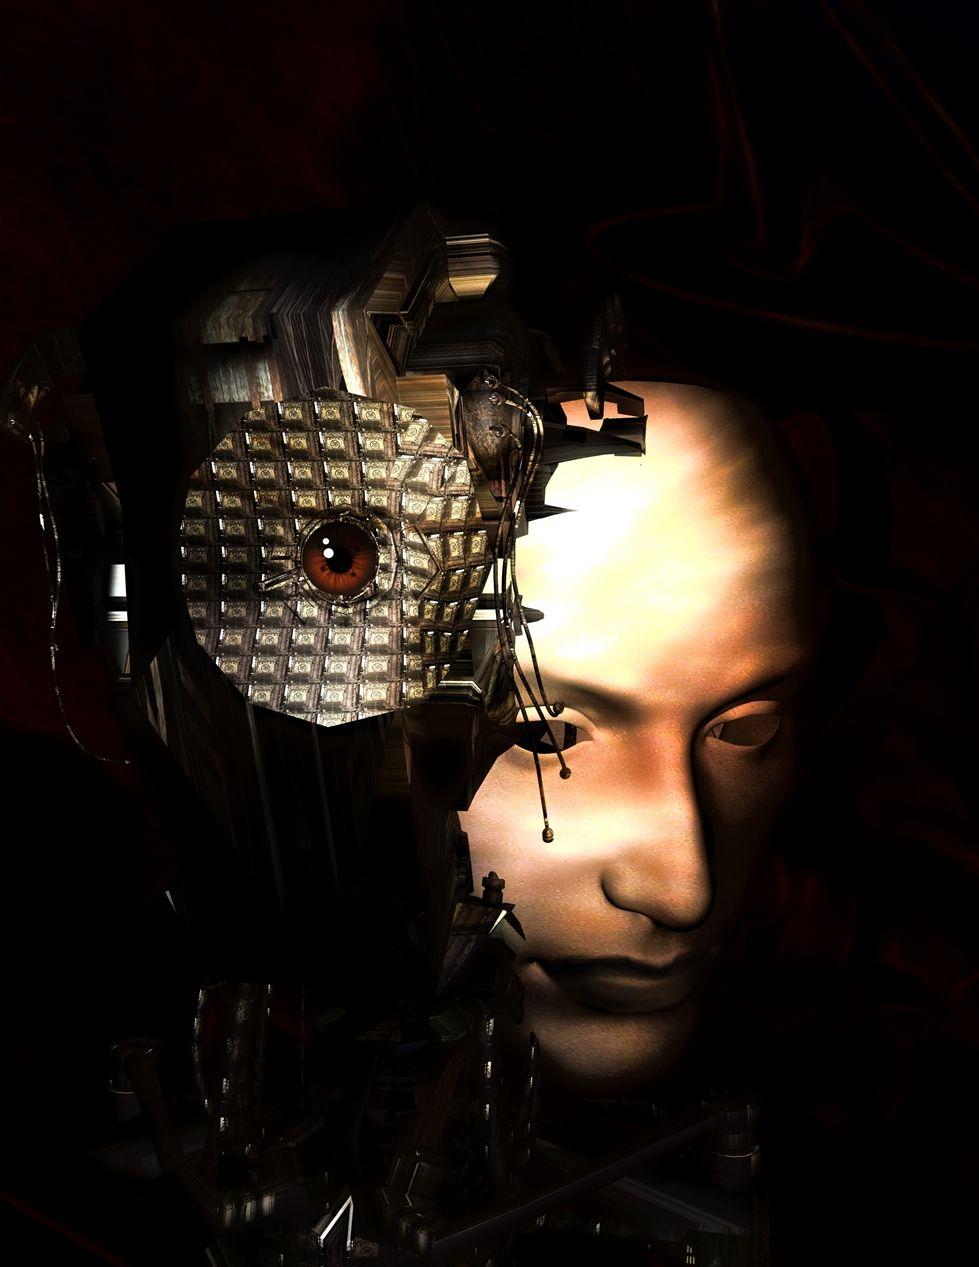 Kunstnet werke digitale kunst surreal human machine